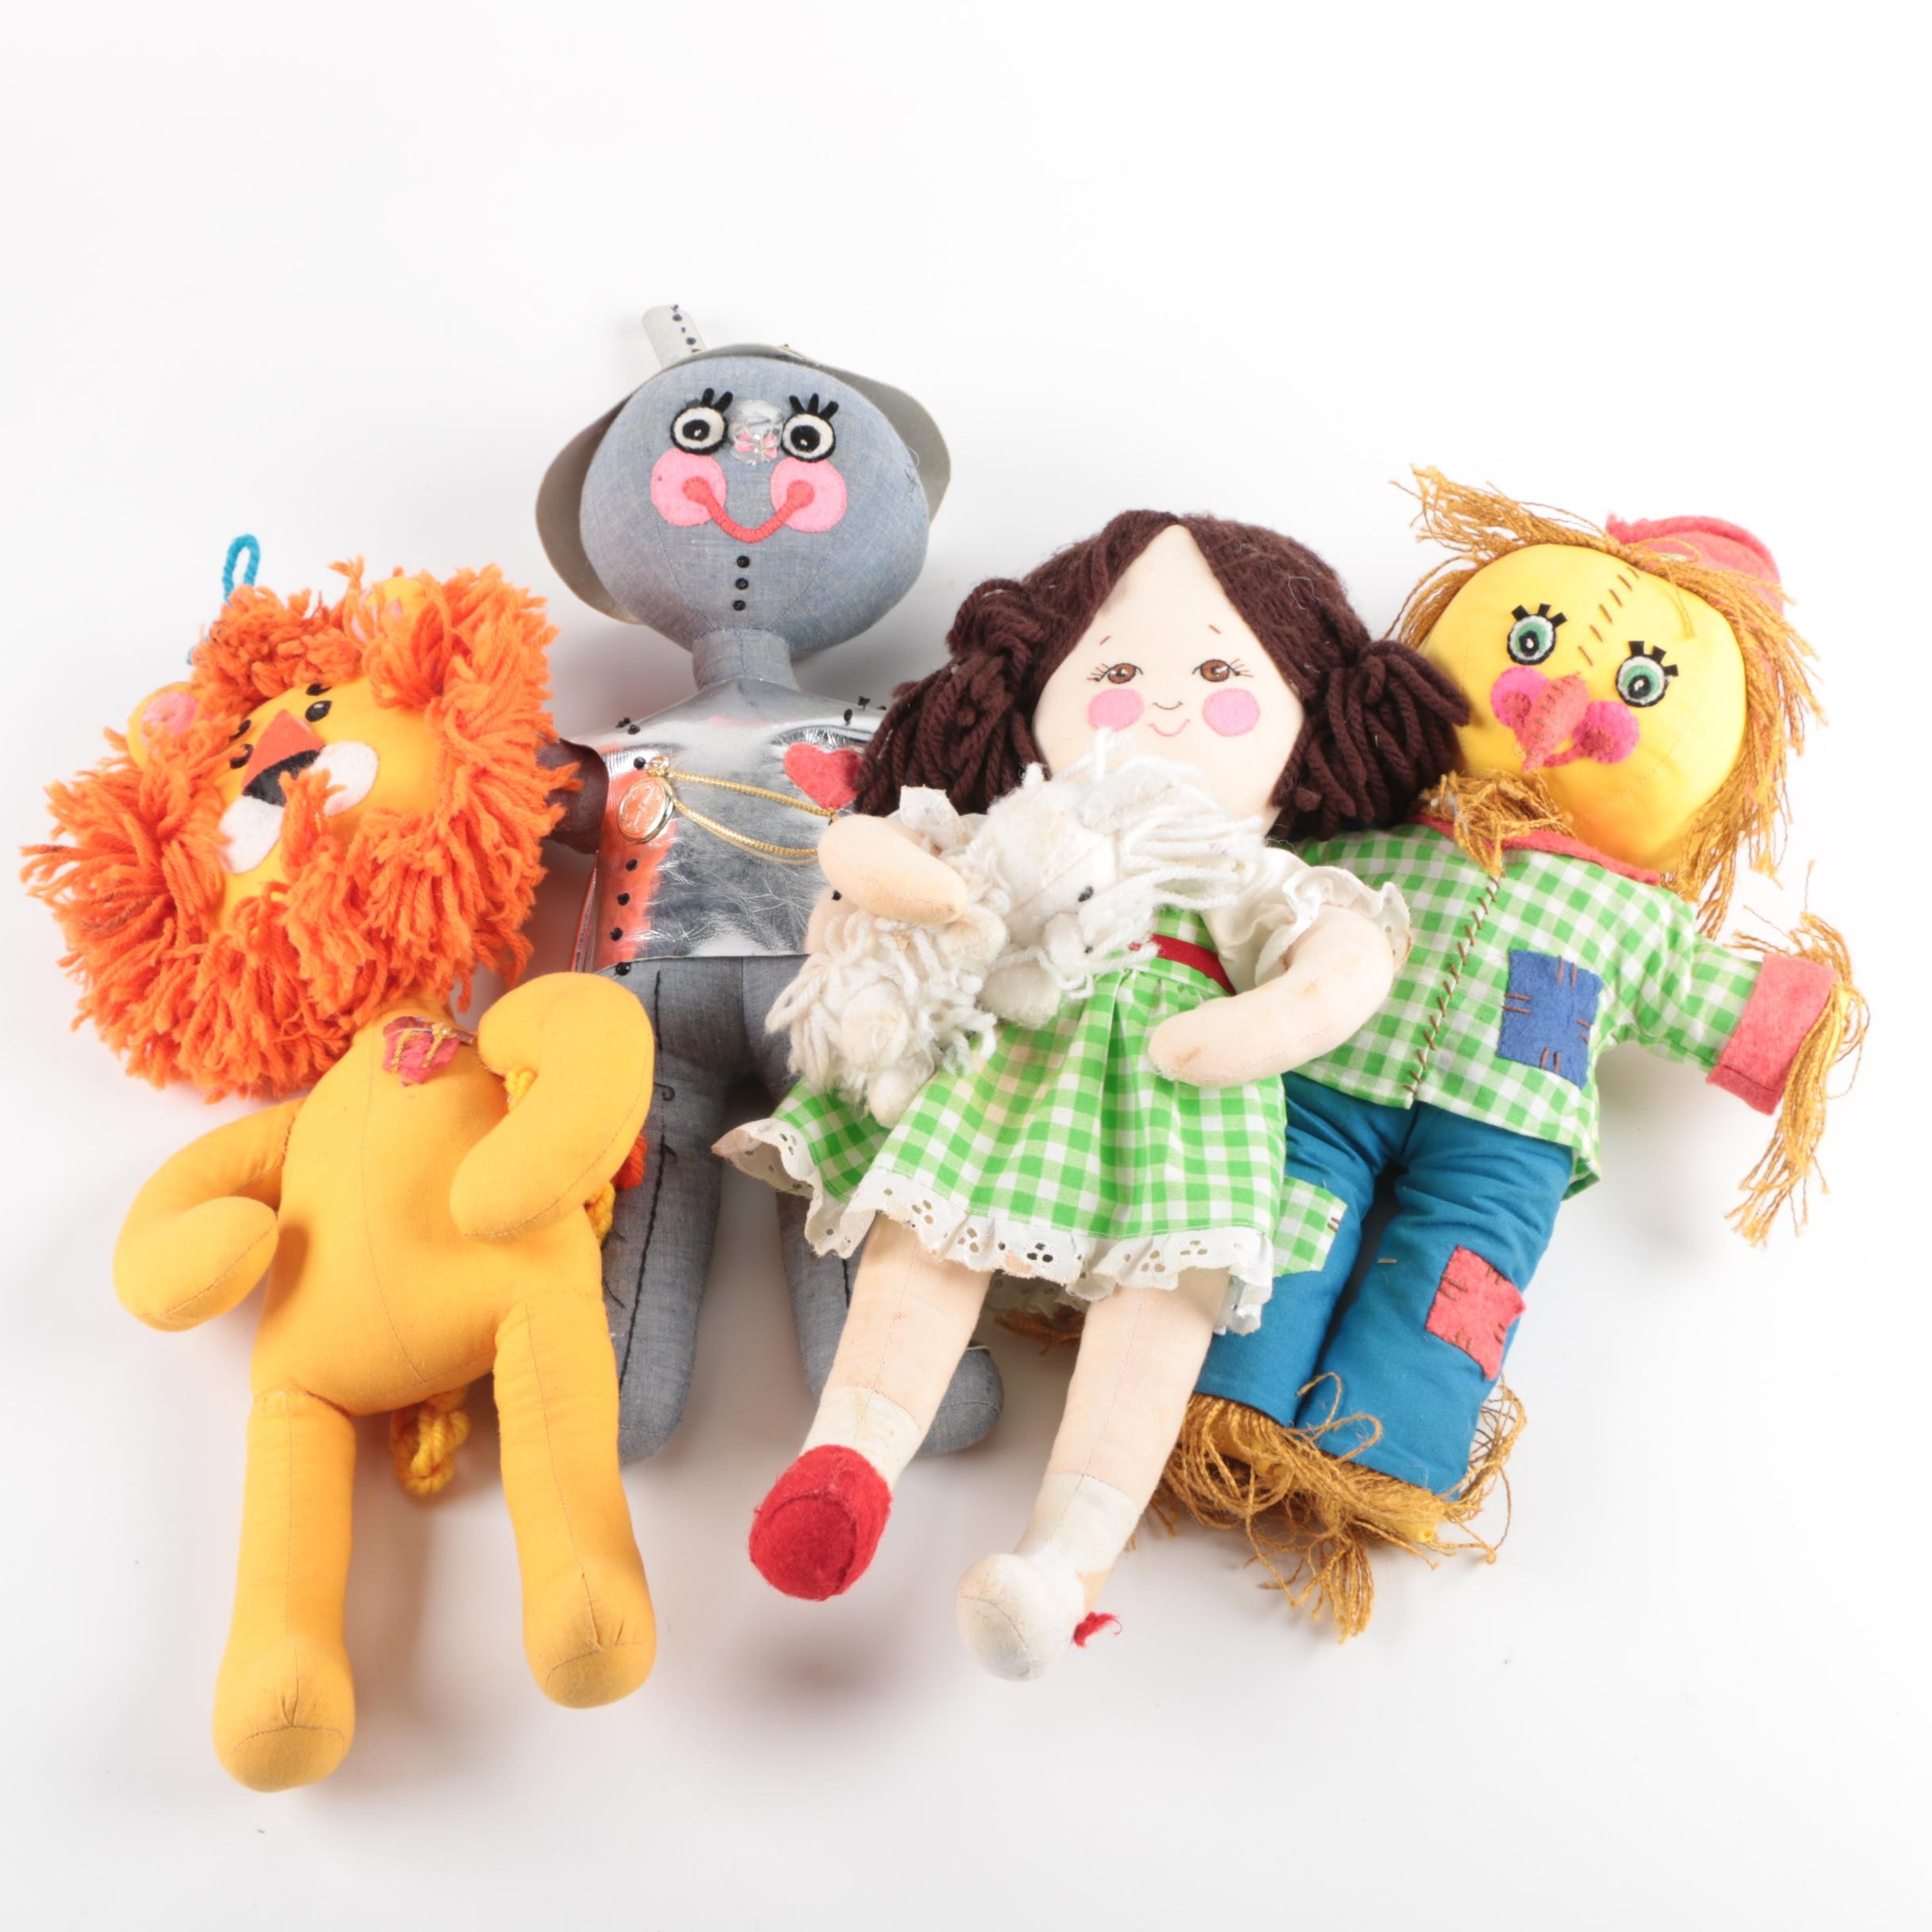 Wizard of Oz Plush Dolls